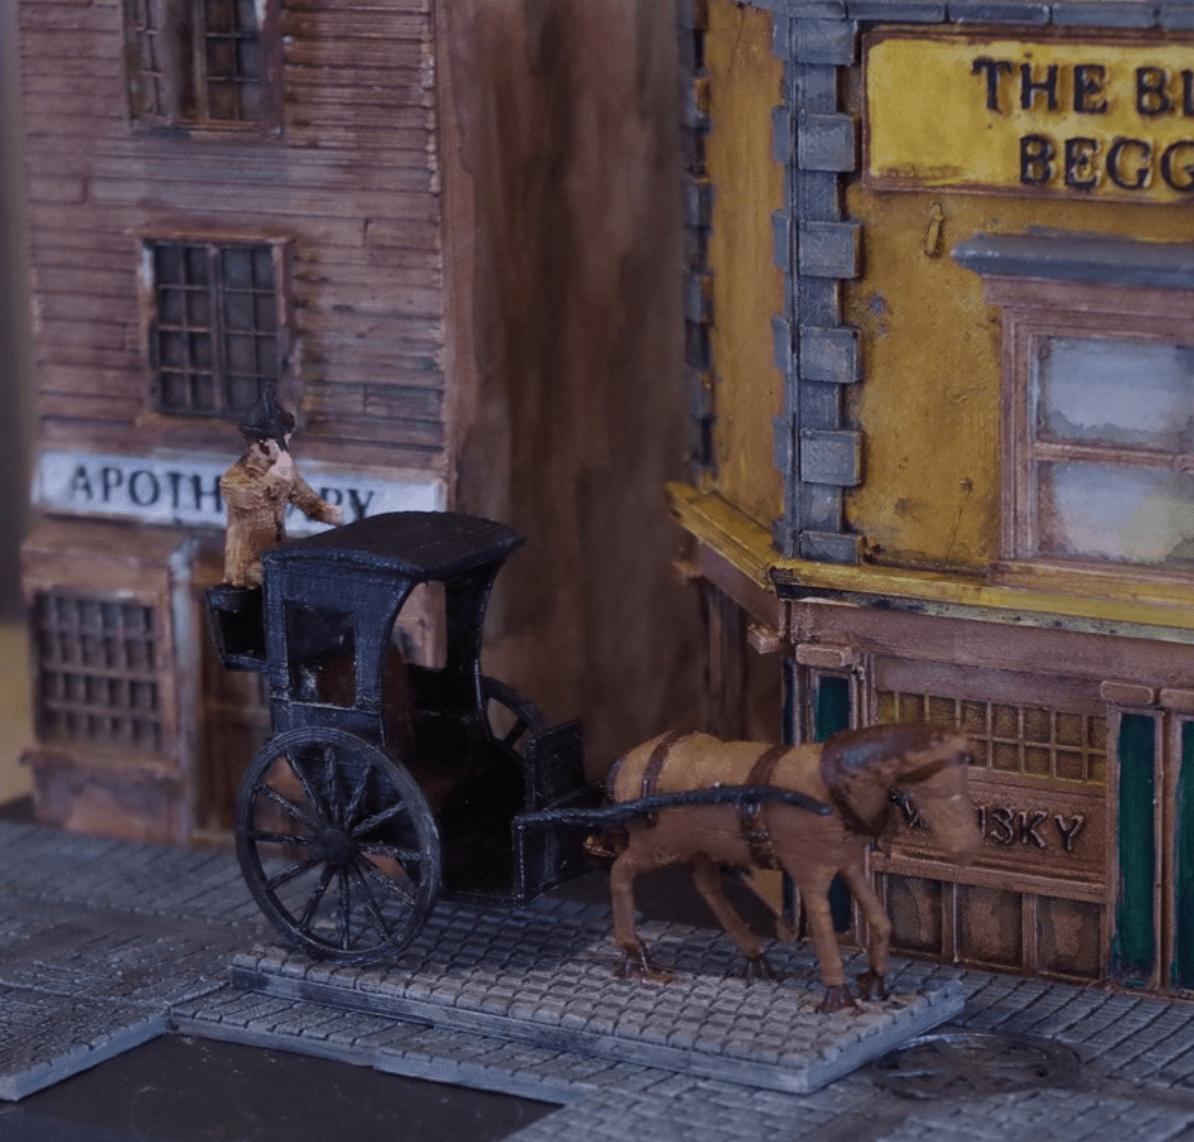 Capture d'écran 2018-04-18 à 09.42.00.png Download free STL file Ripper's London - The Hansom Cab • 3D printable design, Earsling